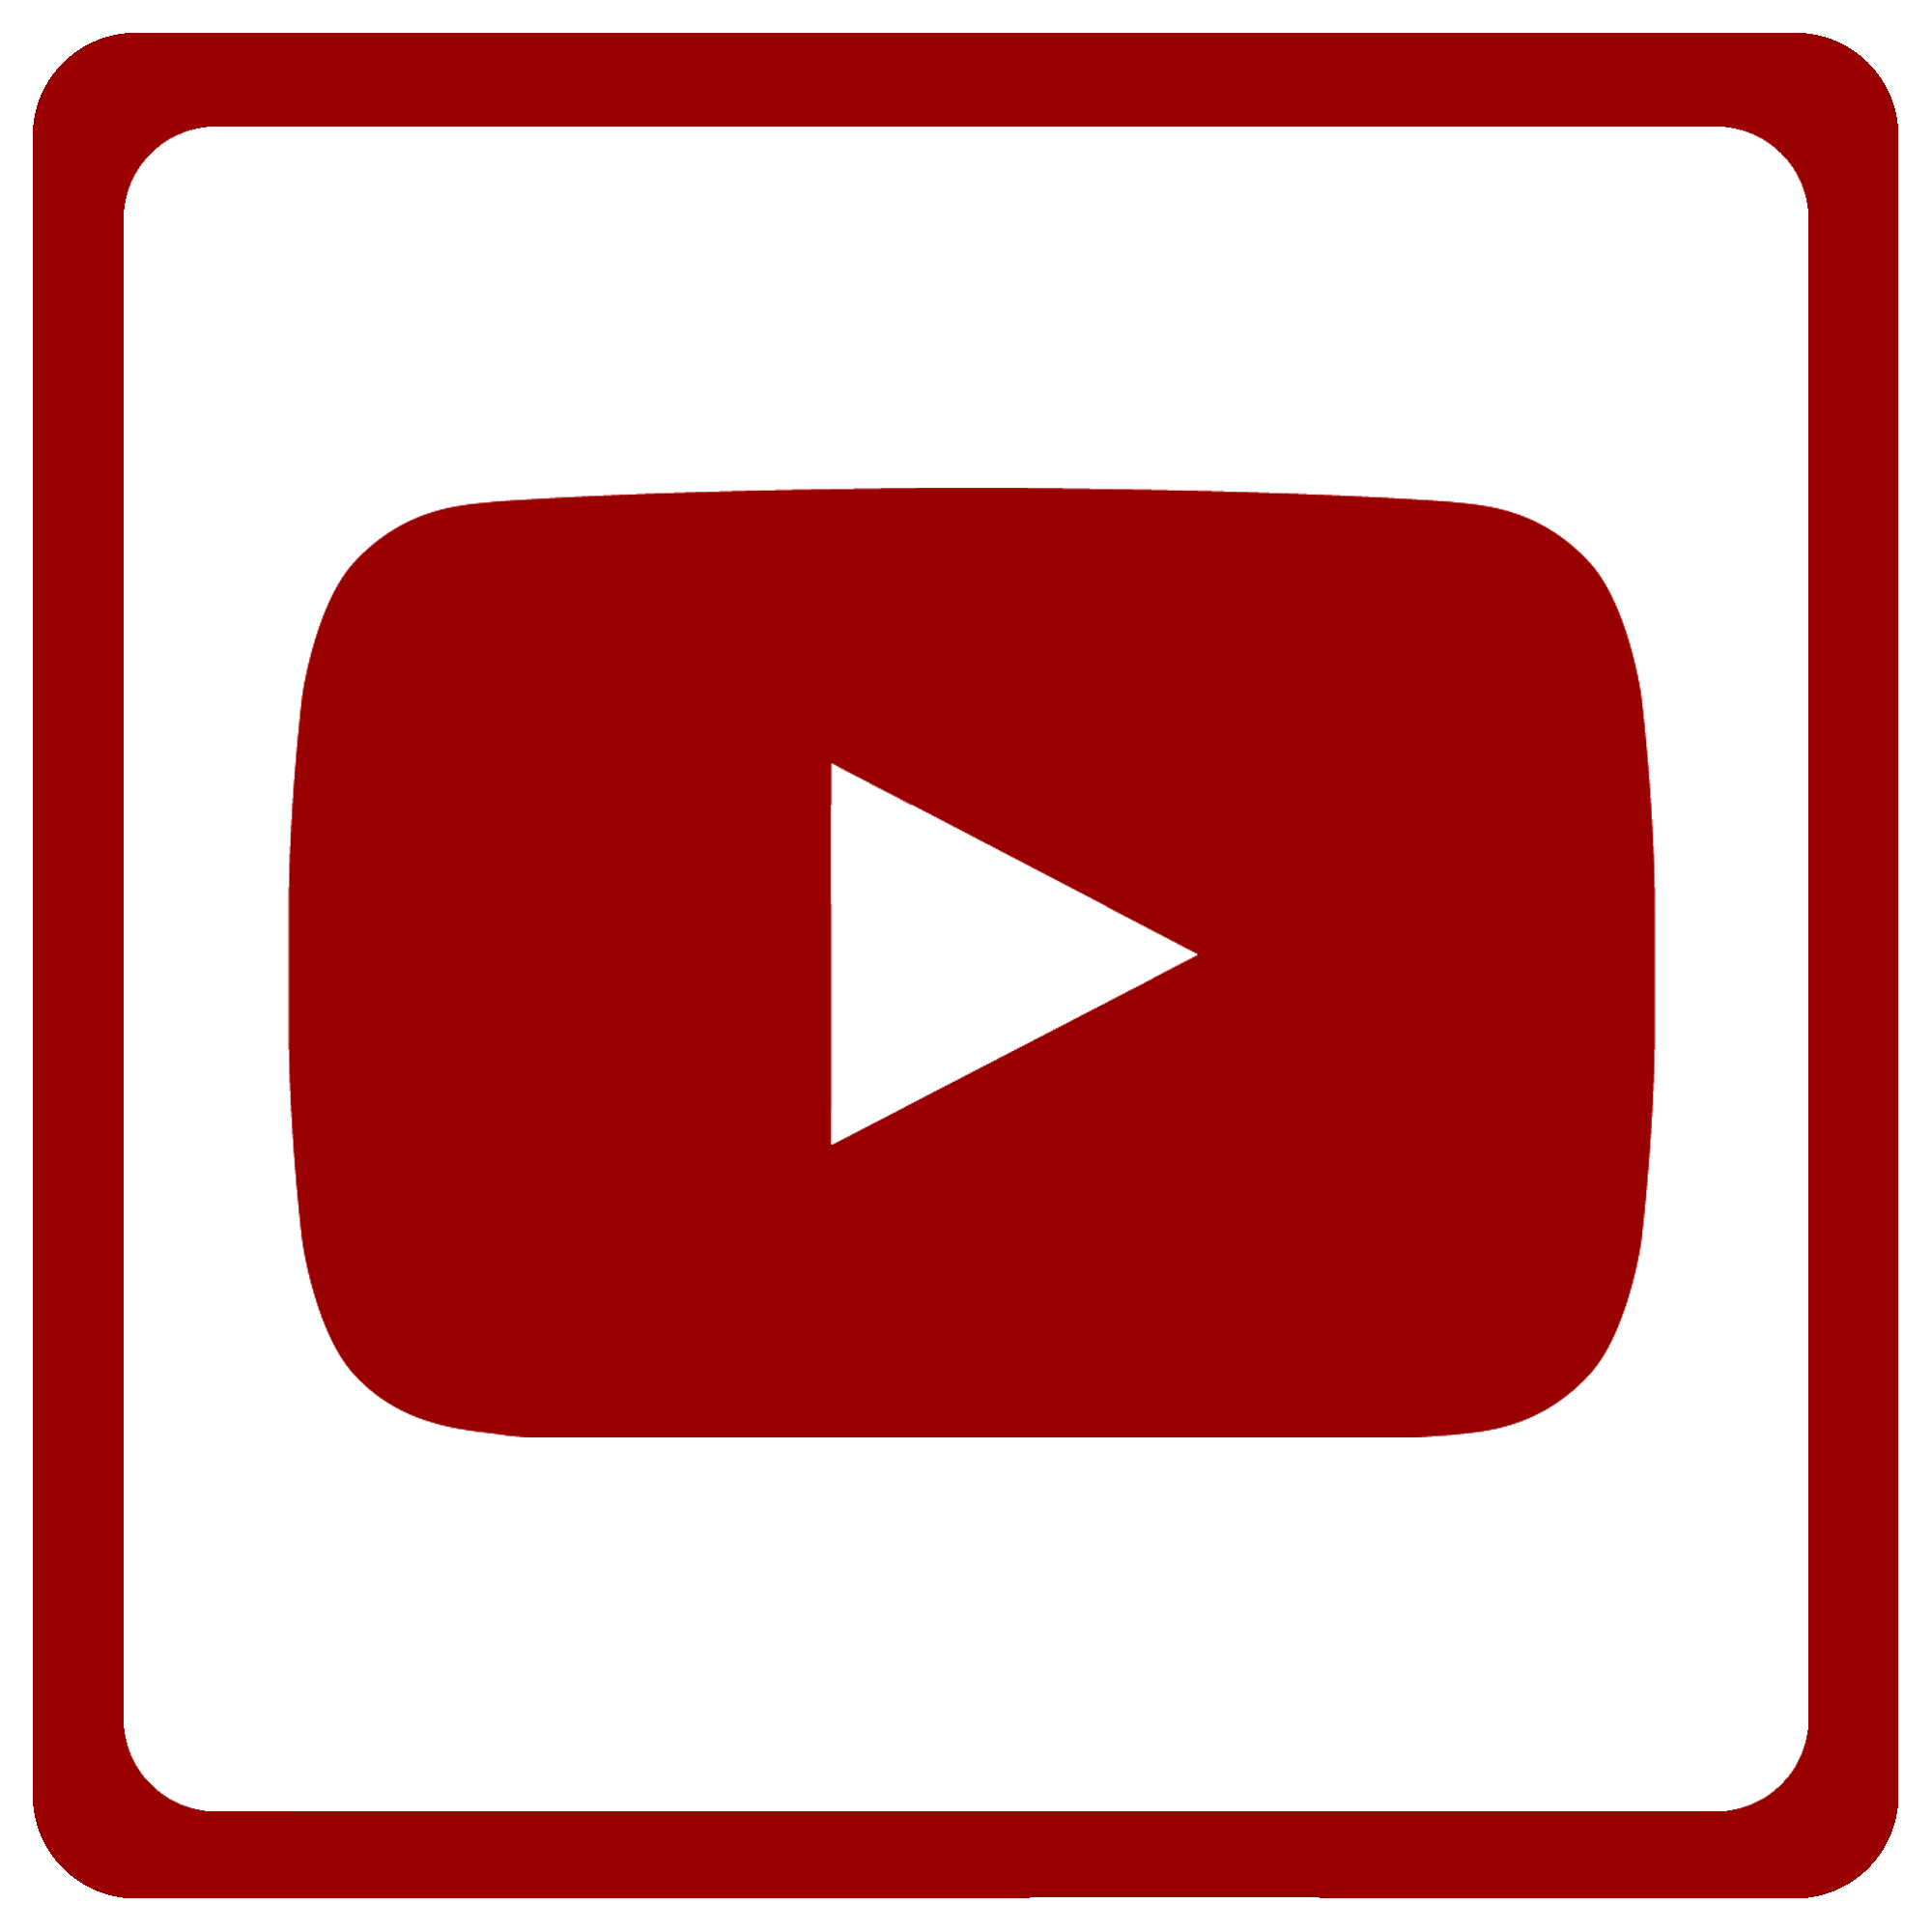 youtube logo square wwwpixsharkcom images galleries